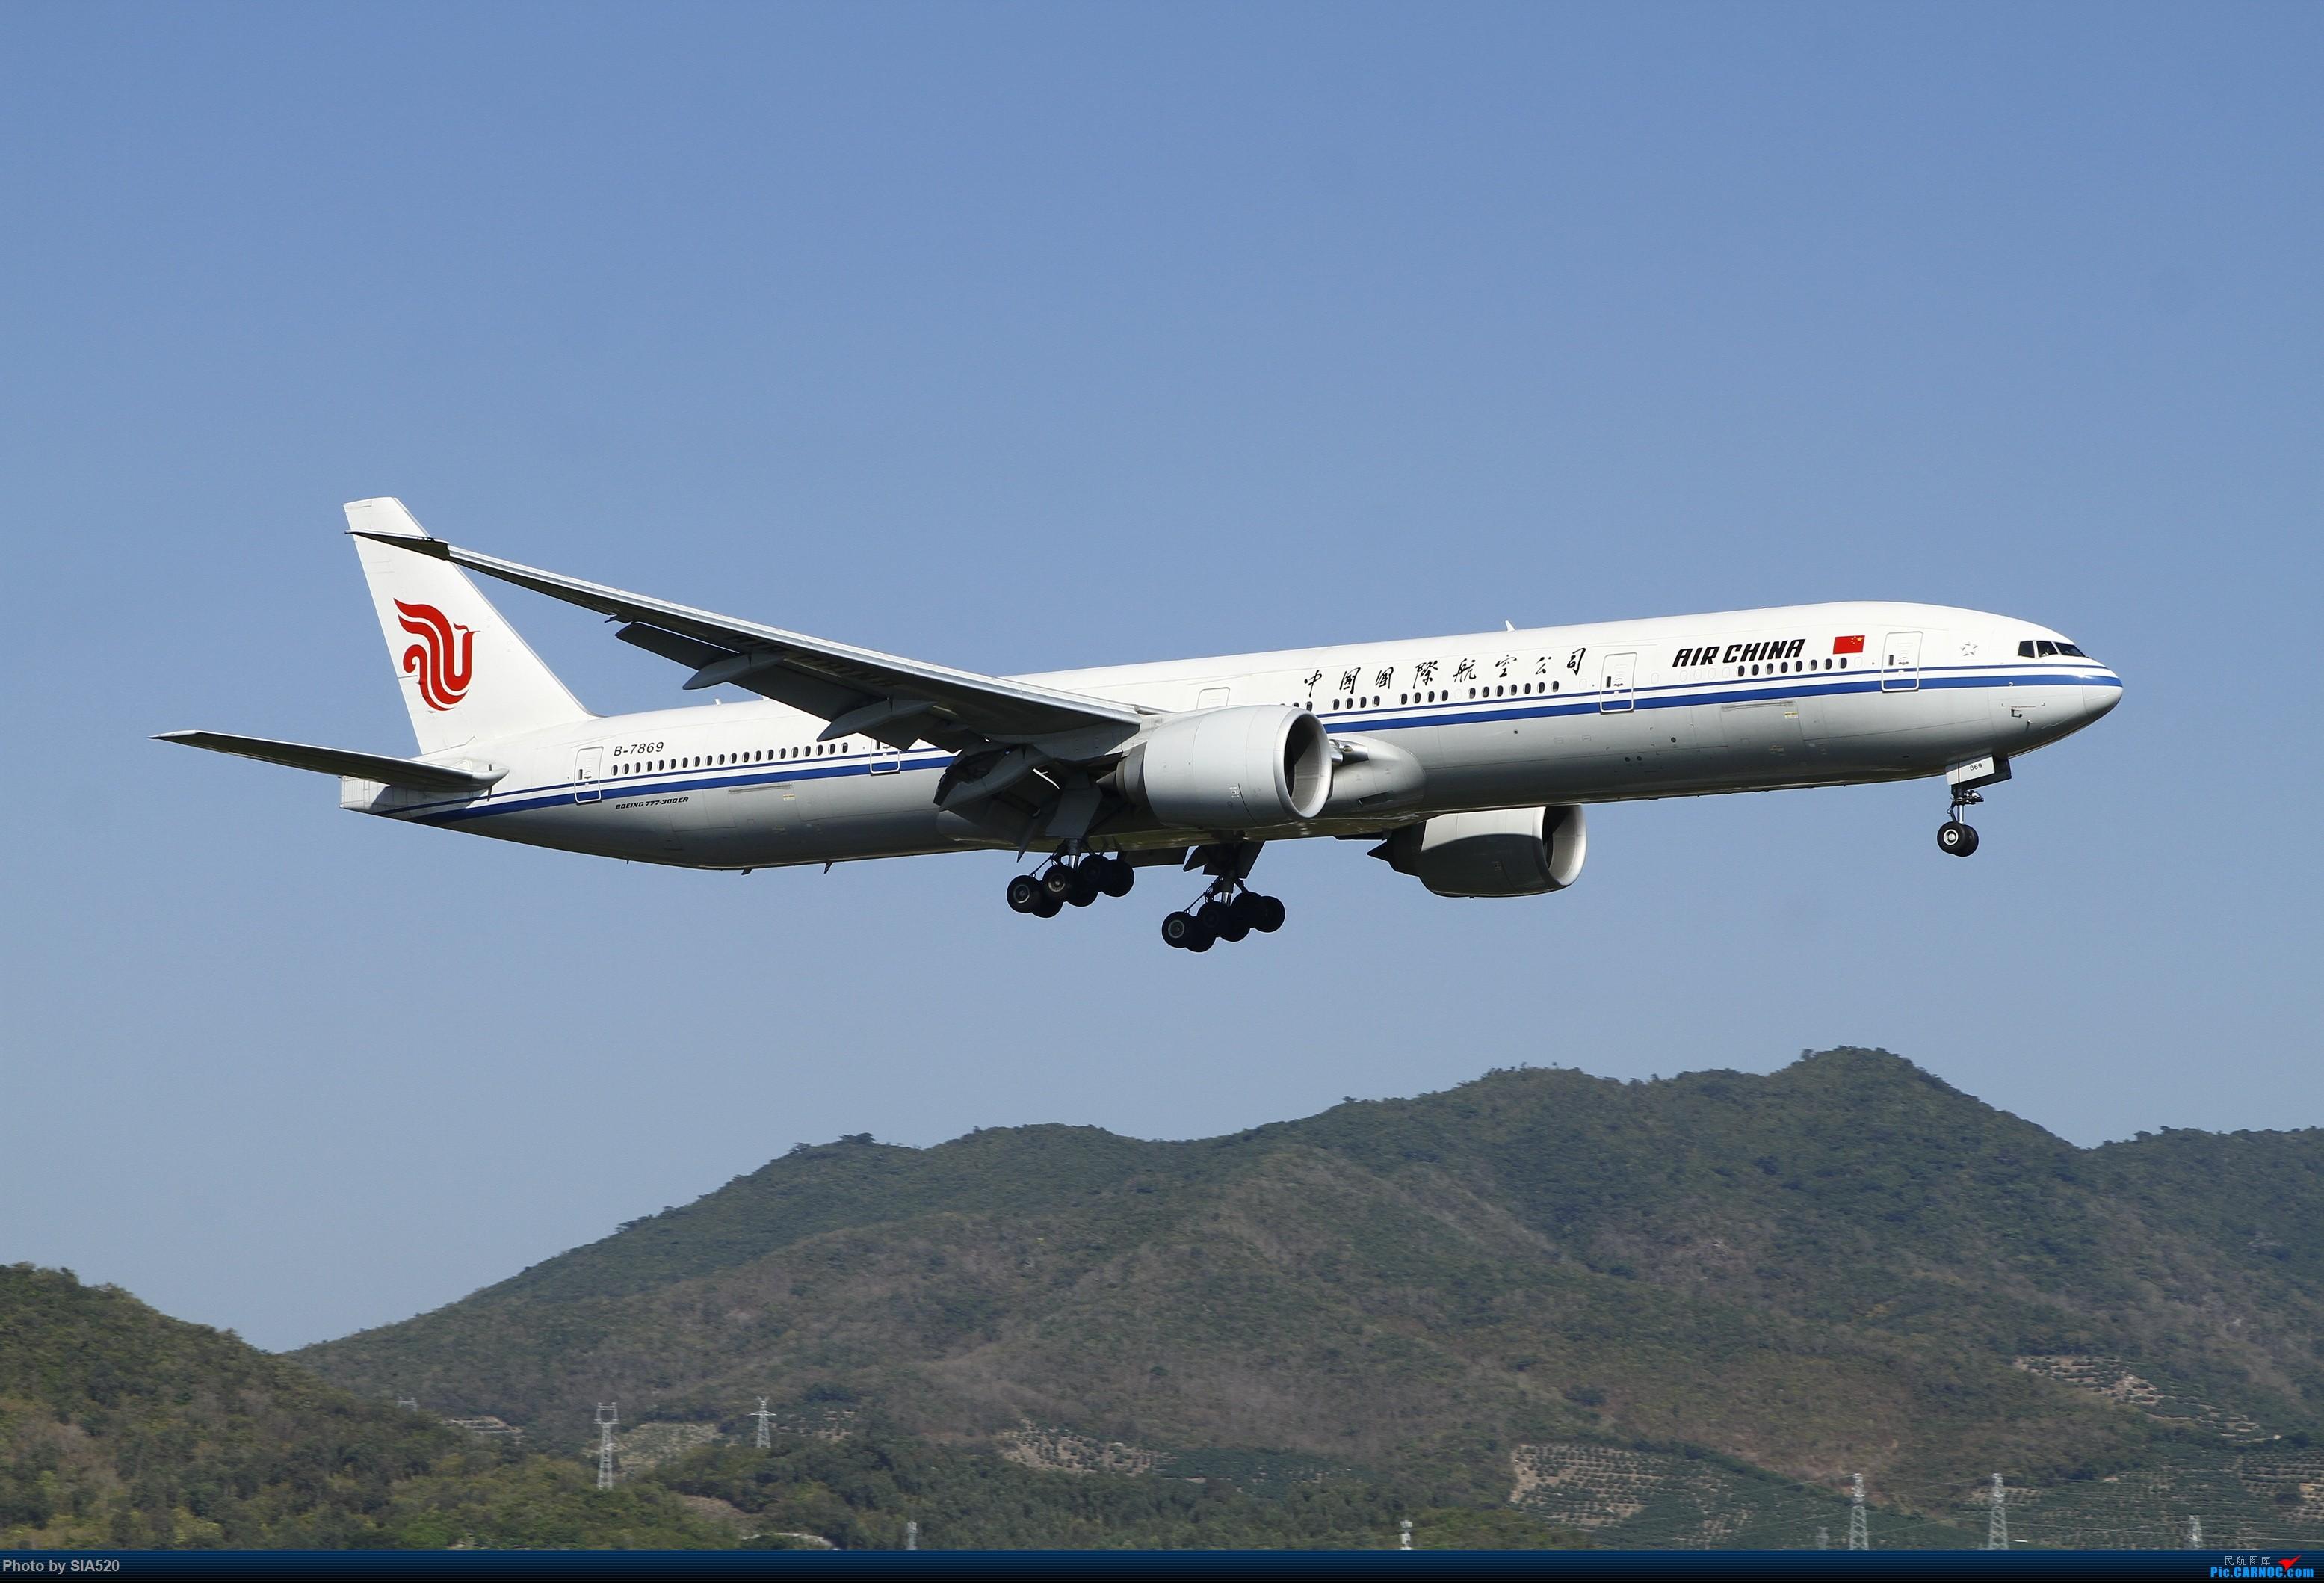 Re:[原创]北京人儿在三亚—600mm解锁凤凰 BOEING 777-300ER B-7869 中国三亚凤凰国际机场